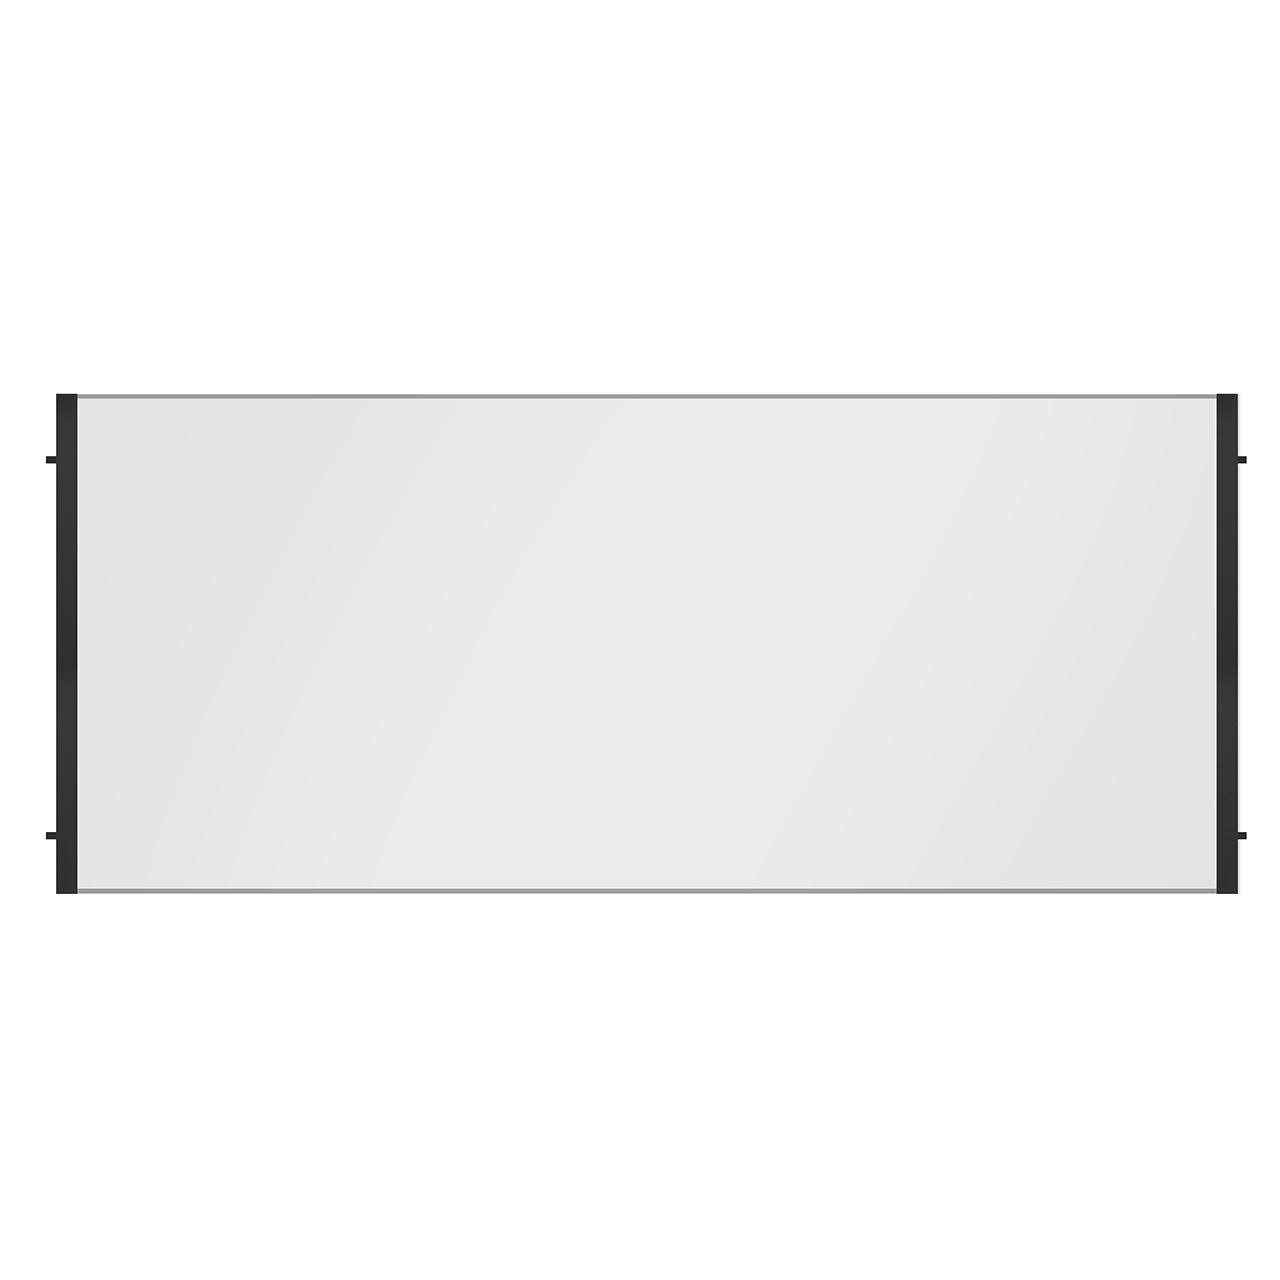 Dimplex FG1500 Front Glass Kit For Opti-Myst Pro 1500 Firebox